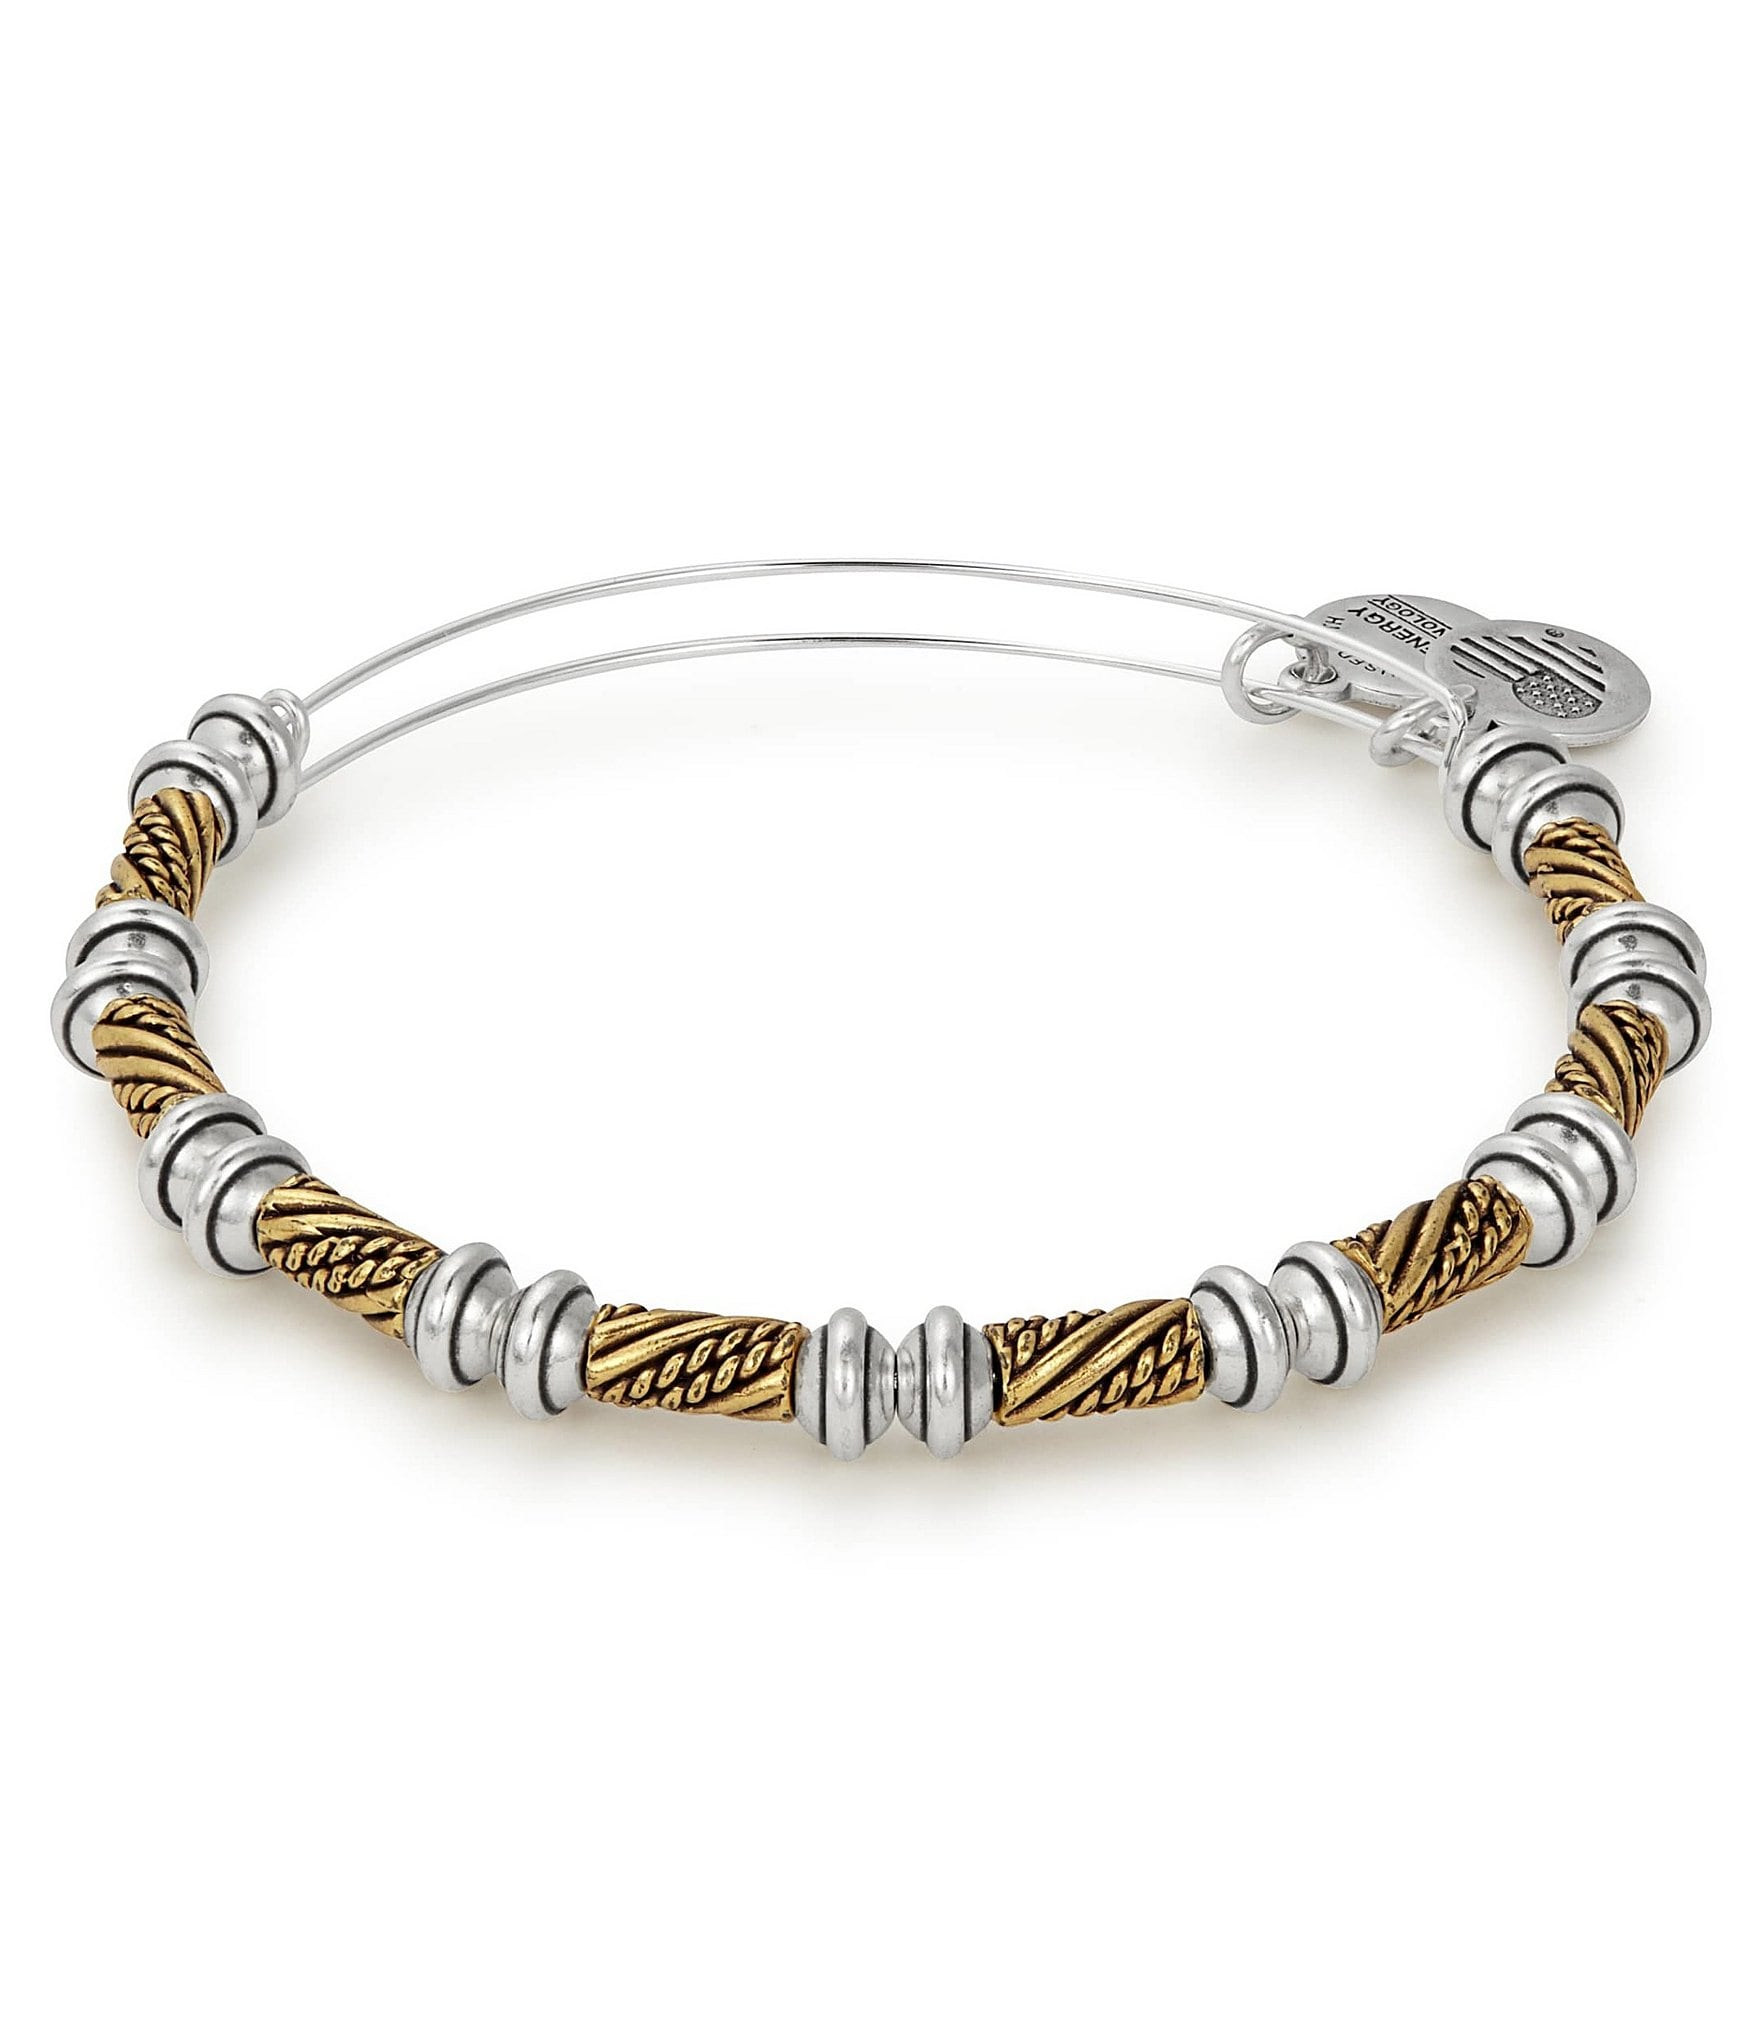 Pandora bracelet dillards - Pandora Bracelet Dillards 53